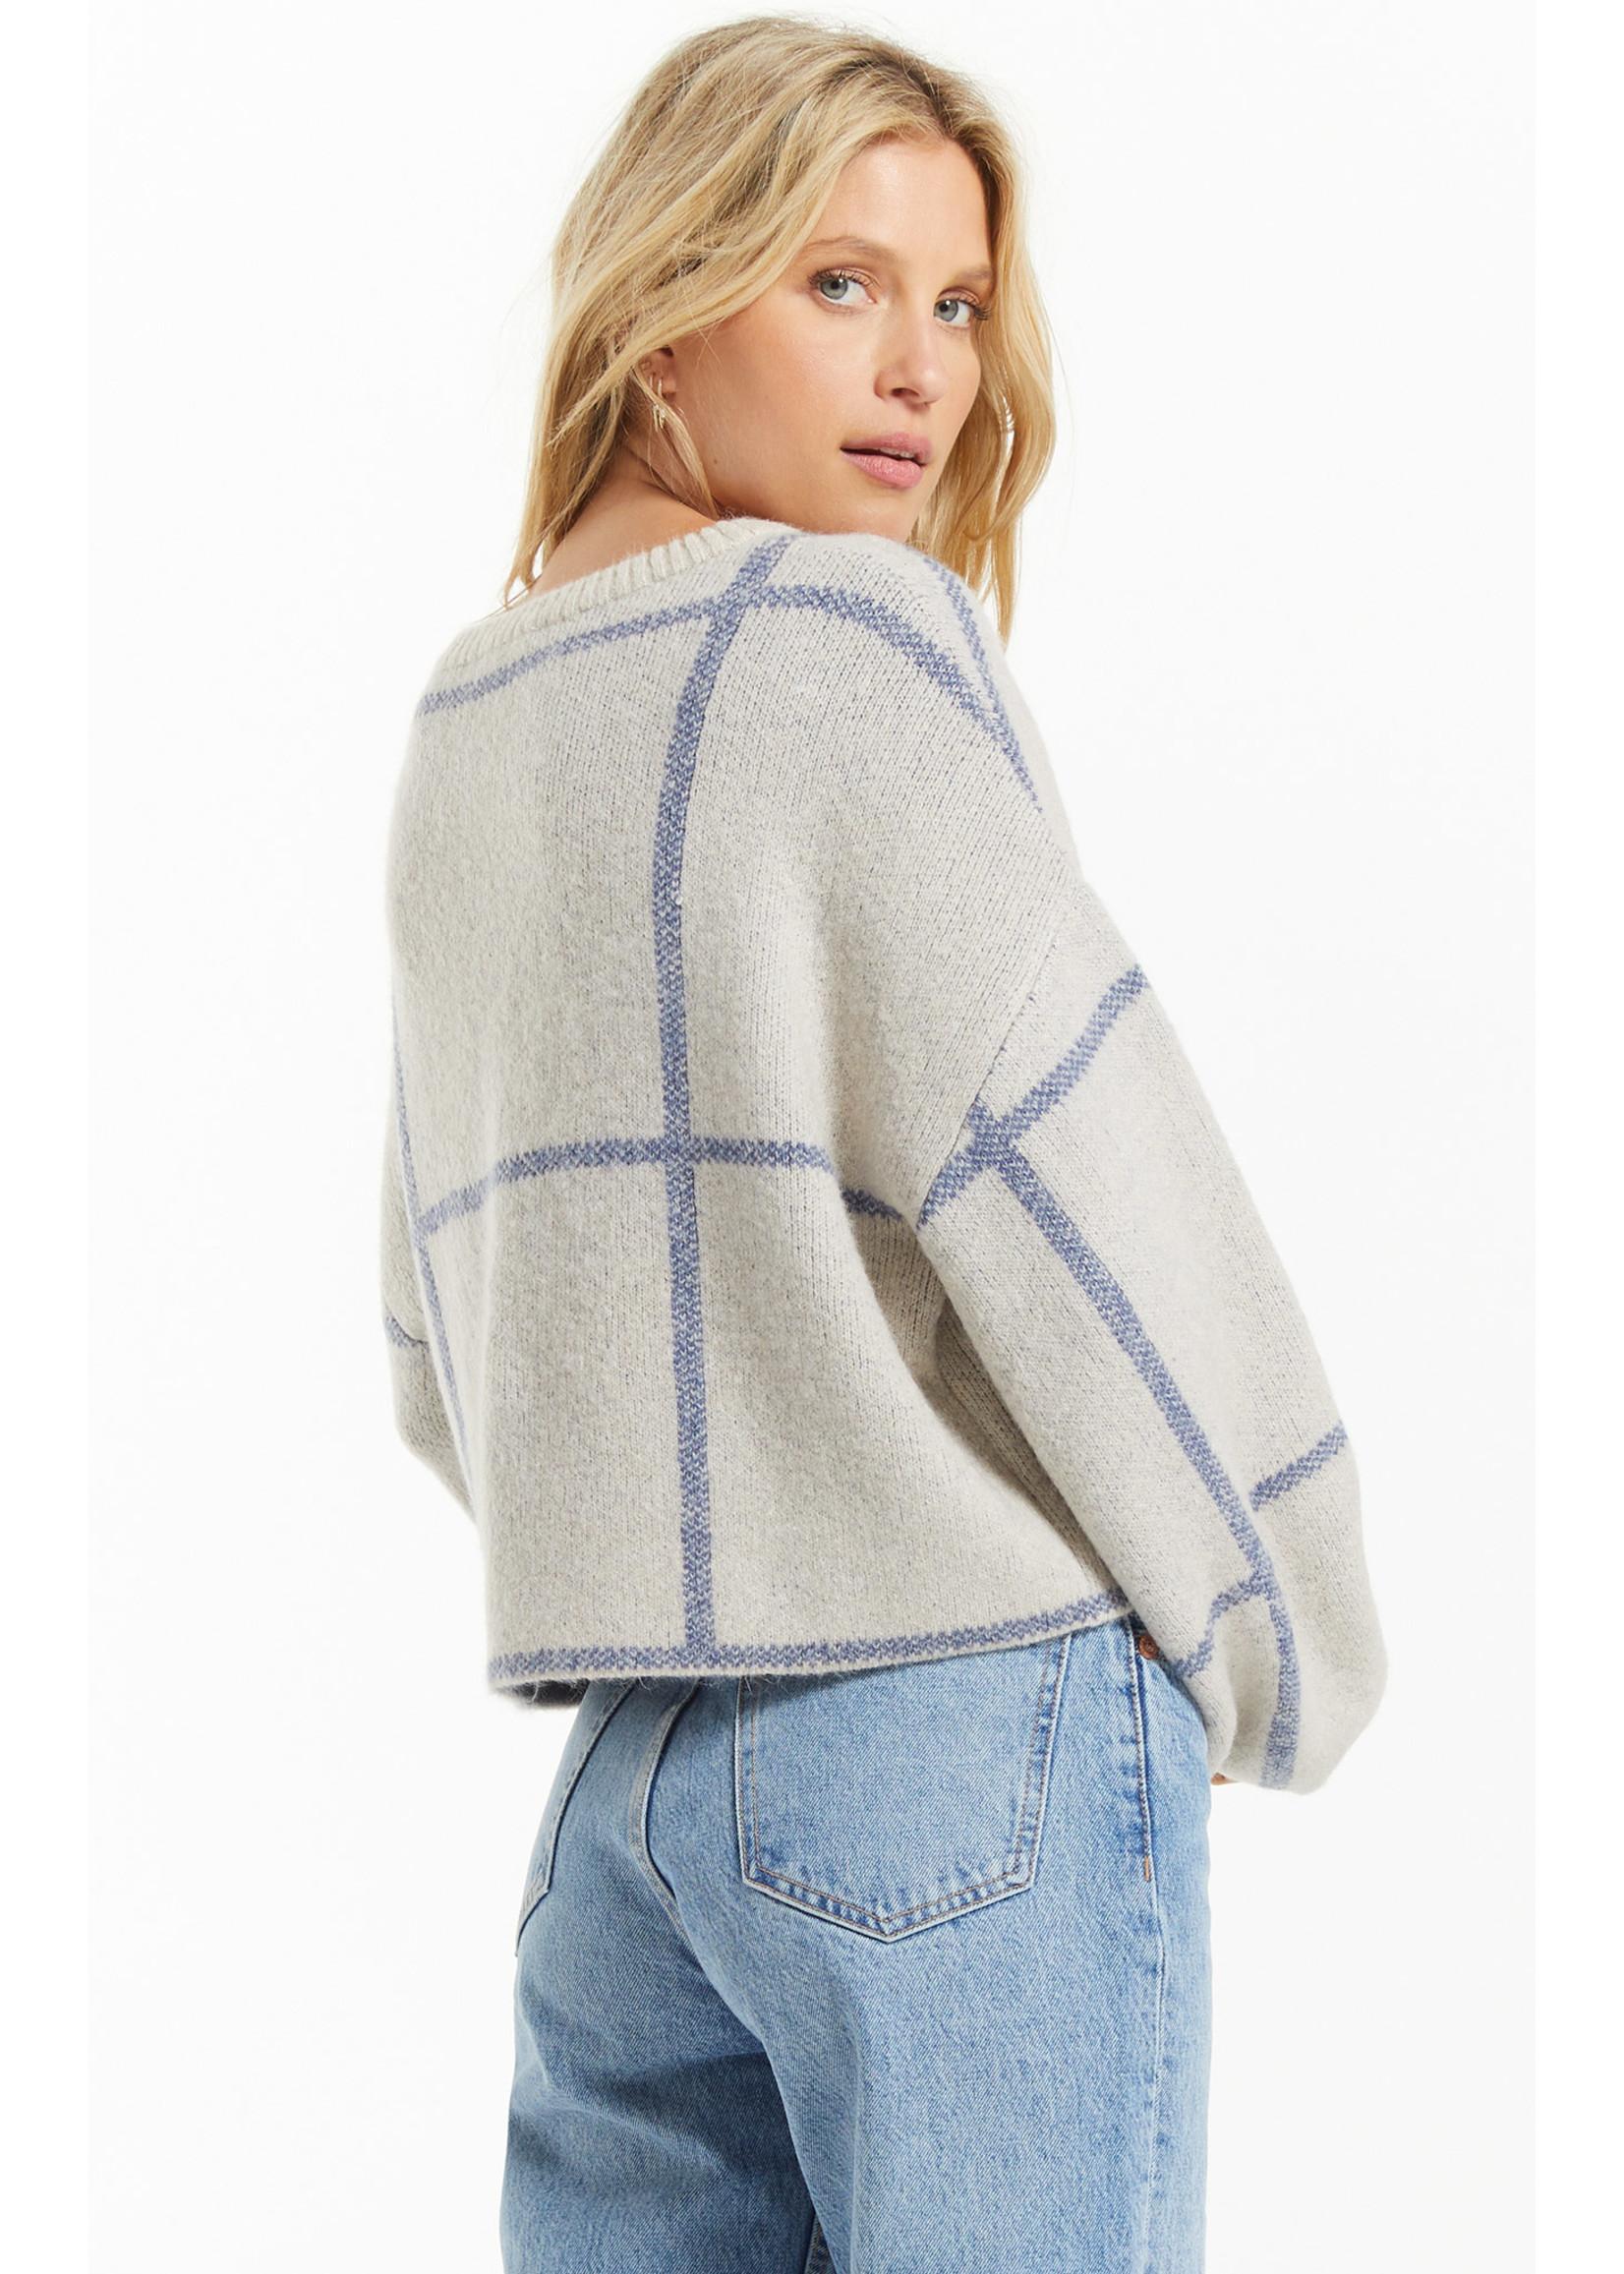 Z Supply Solange Sweater